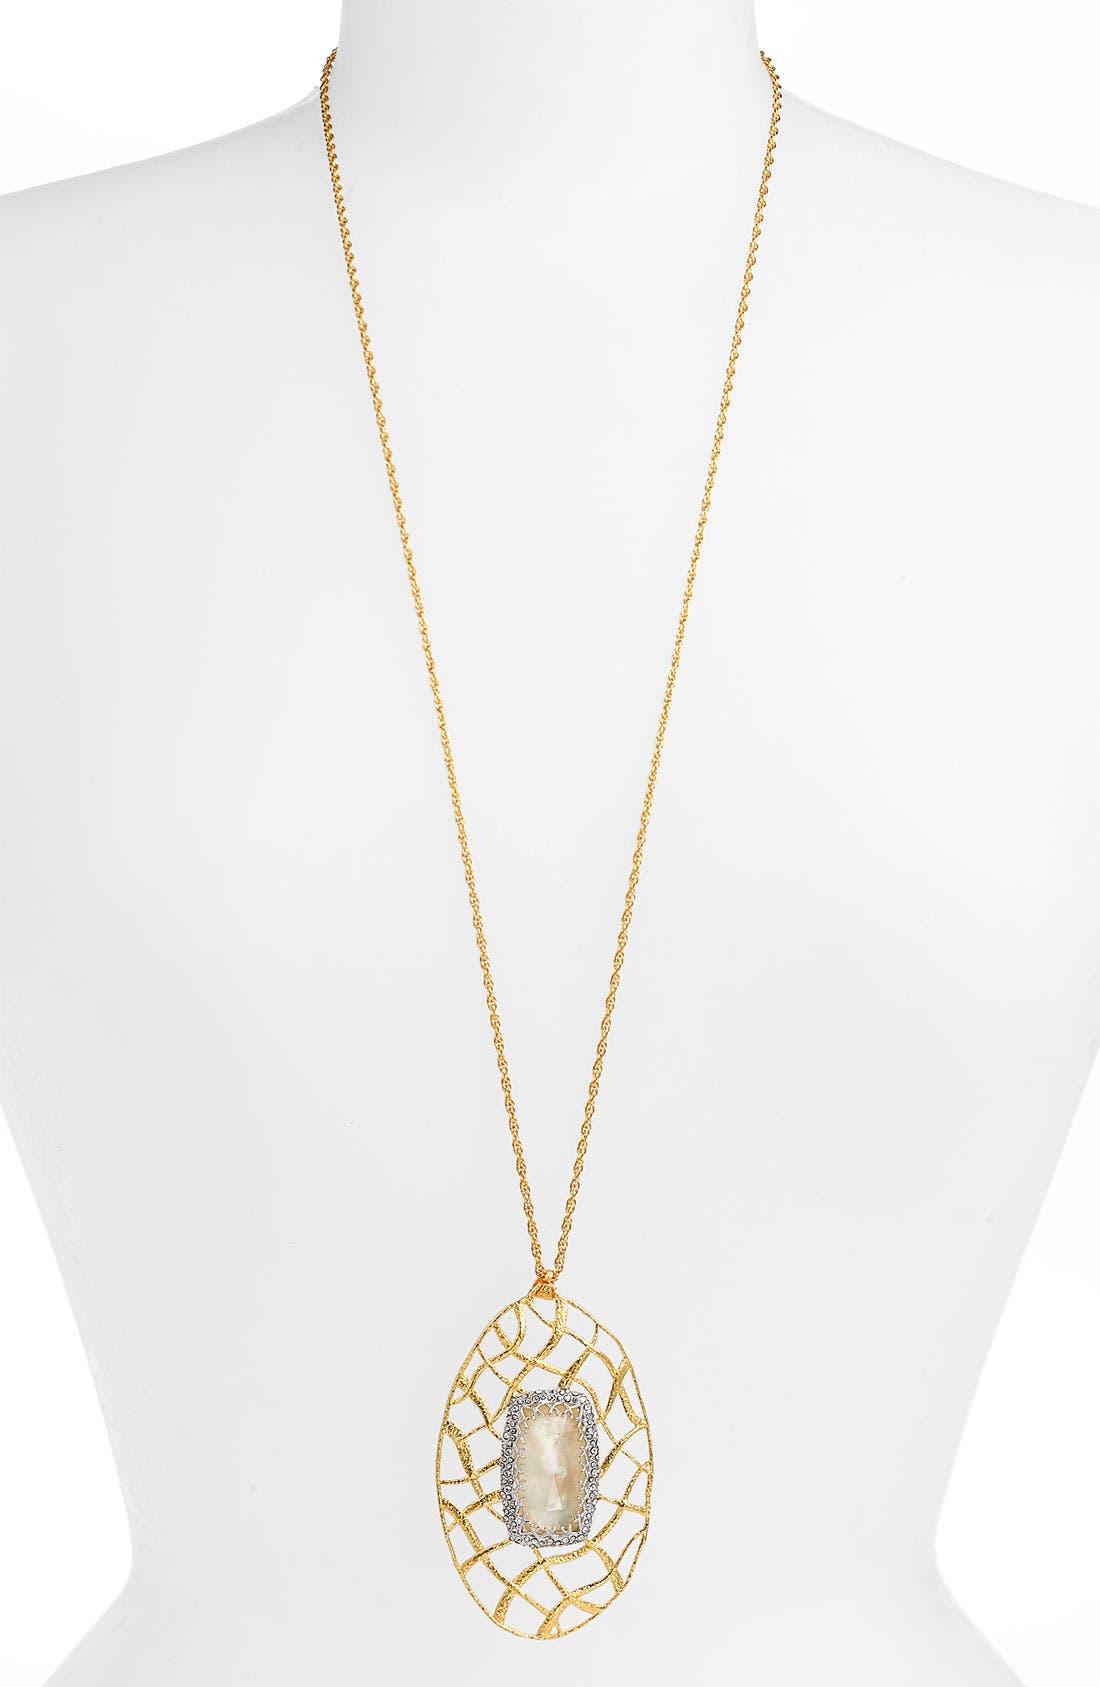 Alternate Image 1 Selected - Alexis Bittar 'Elements' Pavé Accent Long Pendant Necklace (Nordstrom Exclusive)